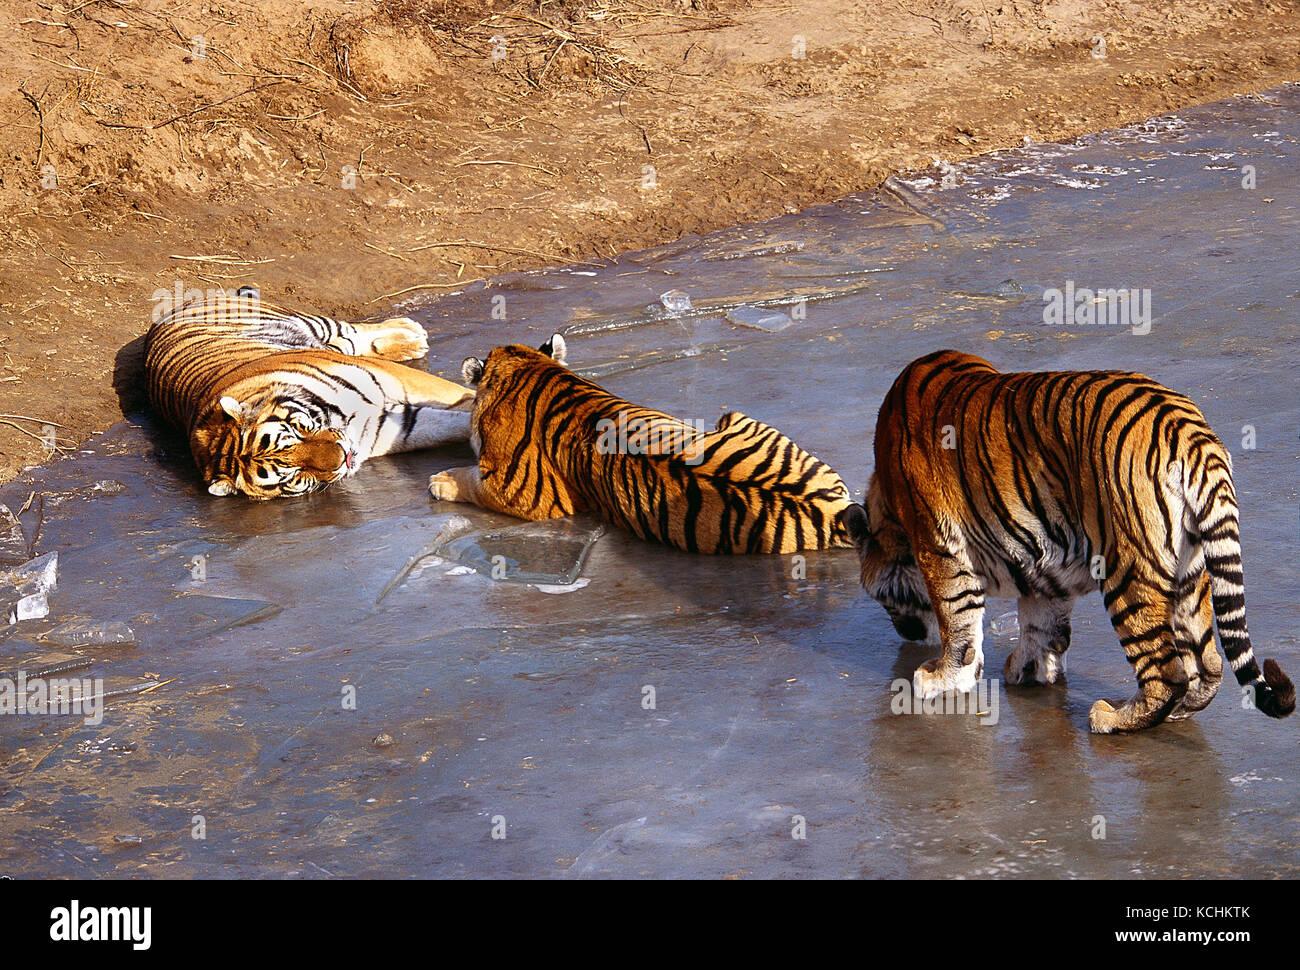 Russia, Siberia / China borders. Wildlife. Three North East China Tigers lying on frozen lake. - Stock Image